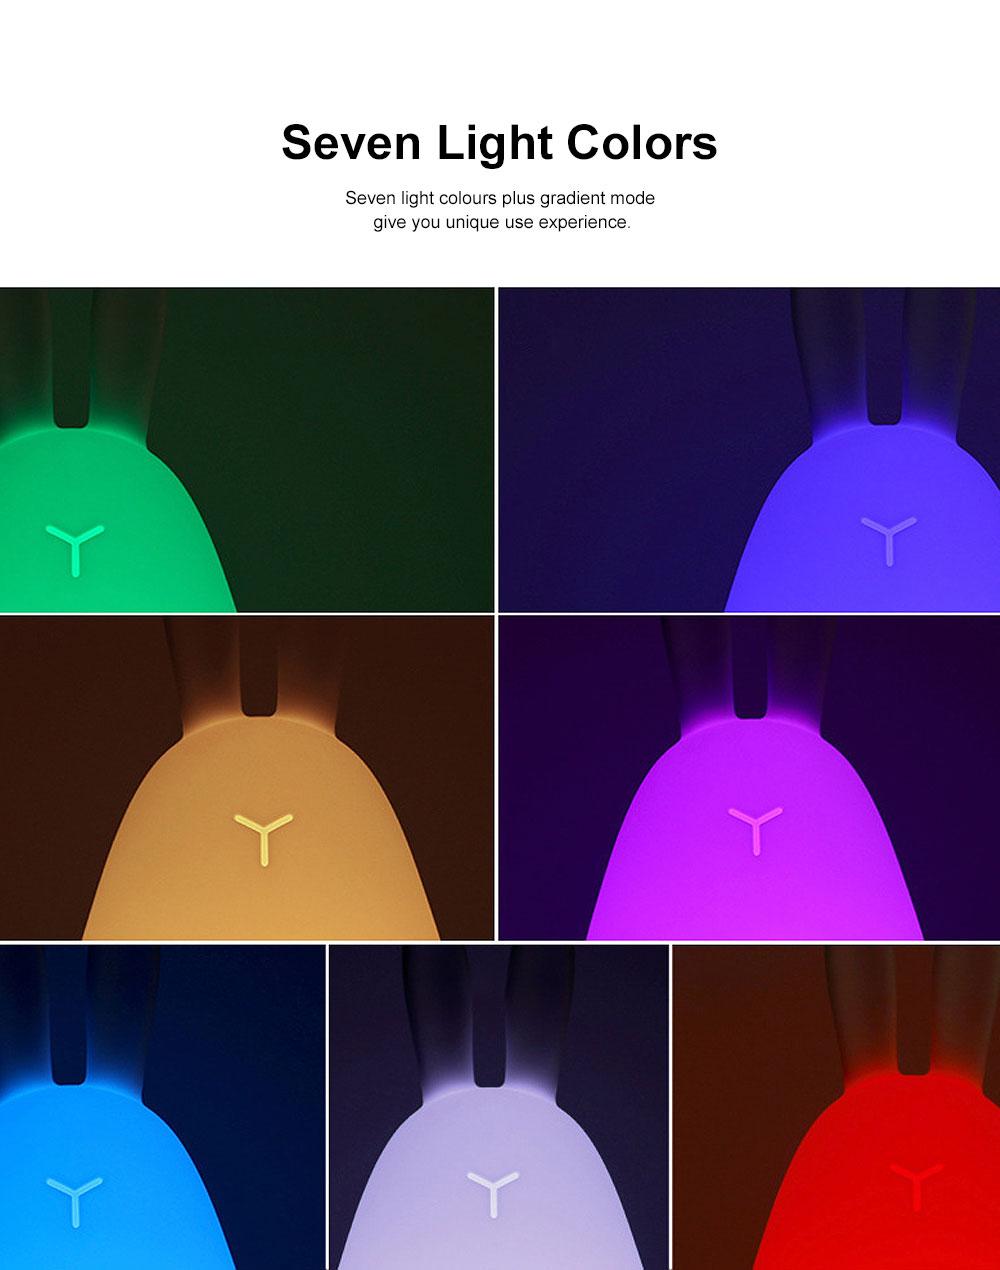 LED Induction Colorful Silicone Night Lamp Creative USB Rabbit Novelty Night Light Rabbit Slap Lamp Multi 7 Colors 2